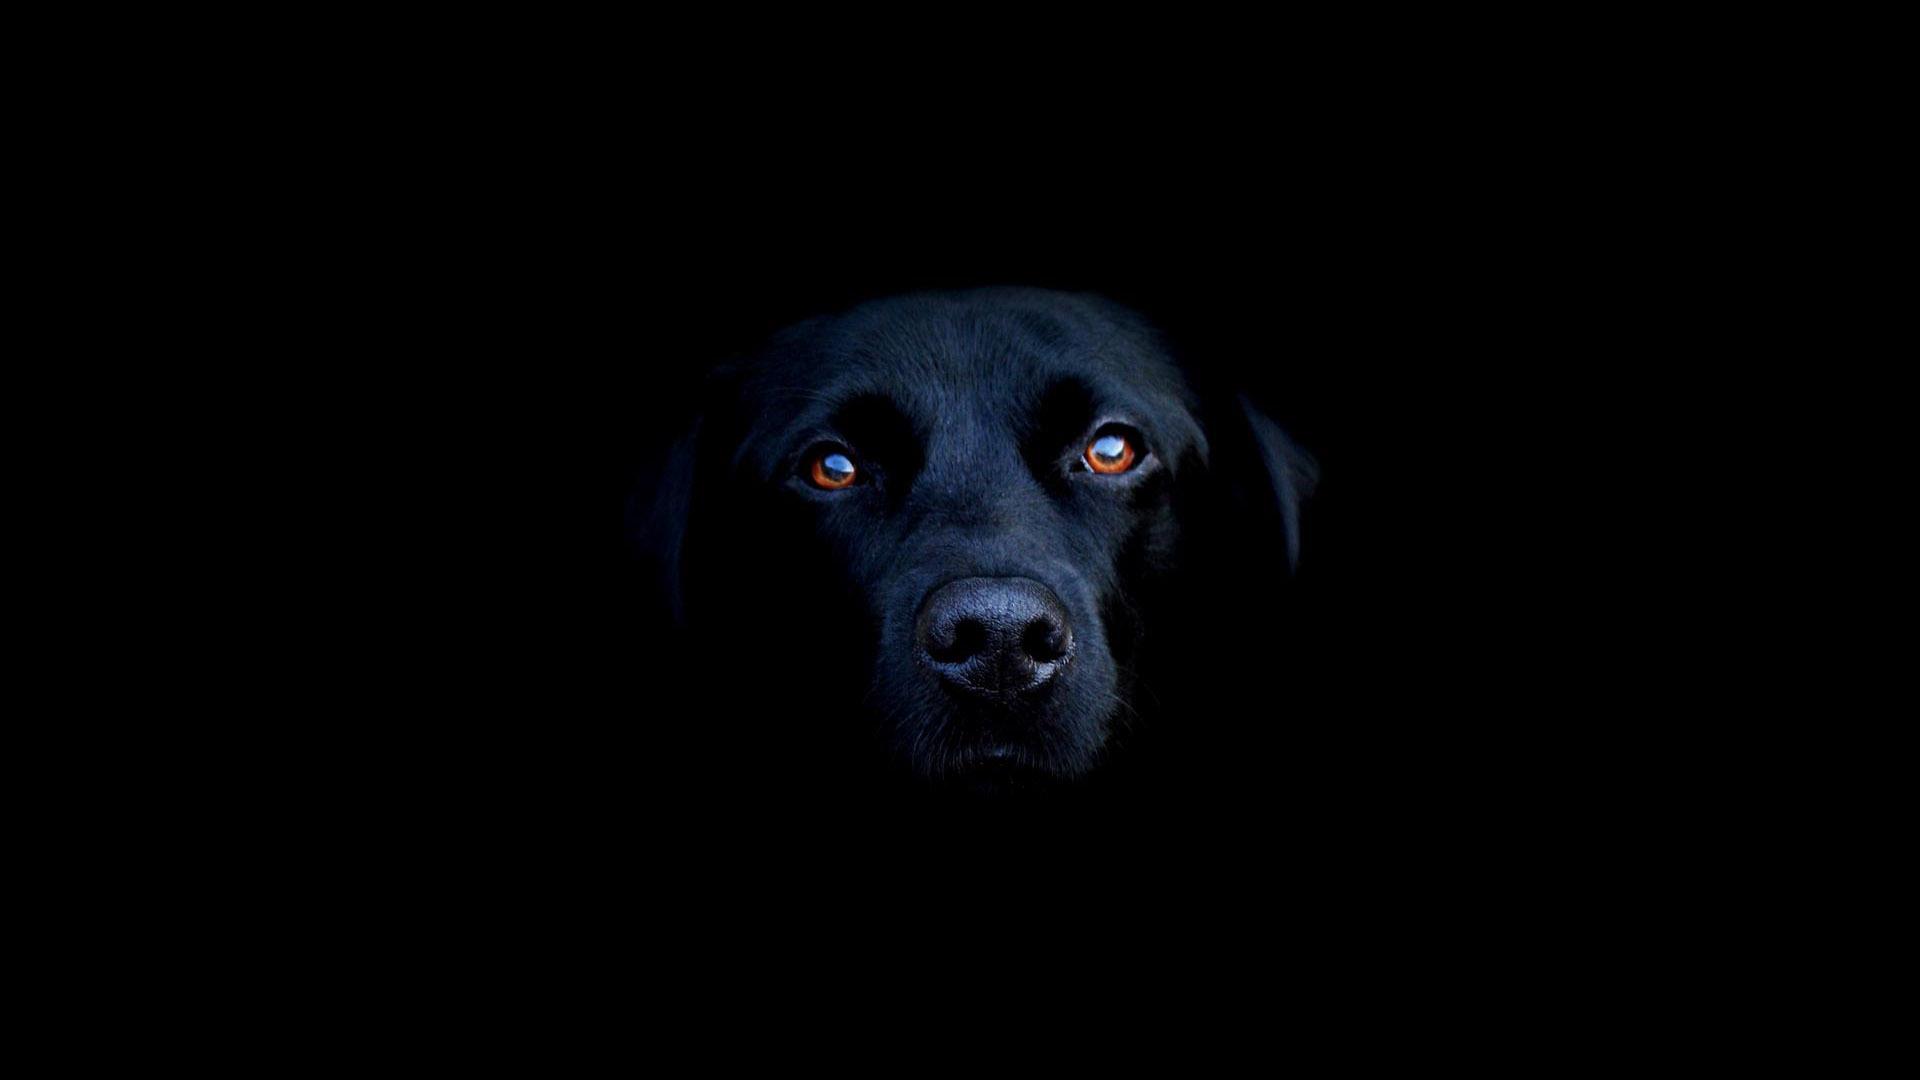 Black Labrador Dog 1920x1080 HD Image Animals Pets 1920x1080